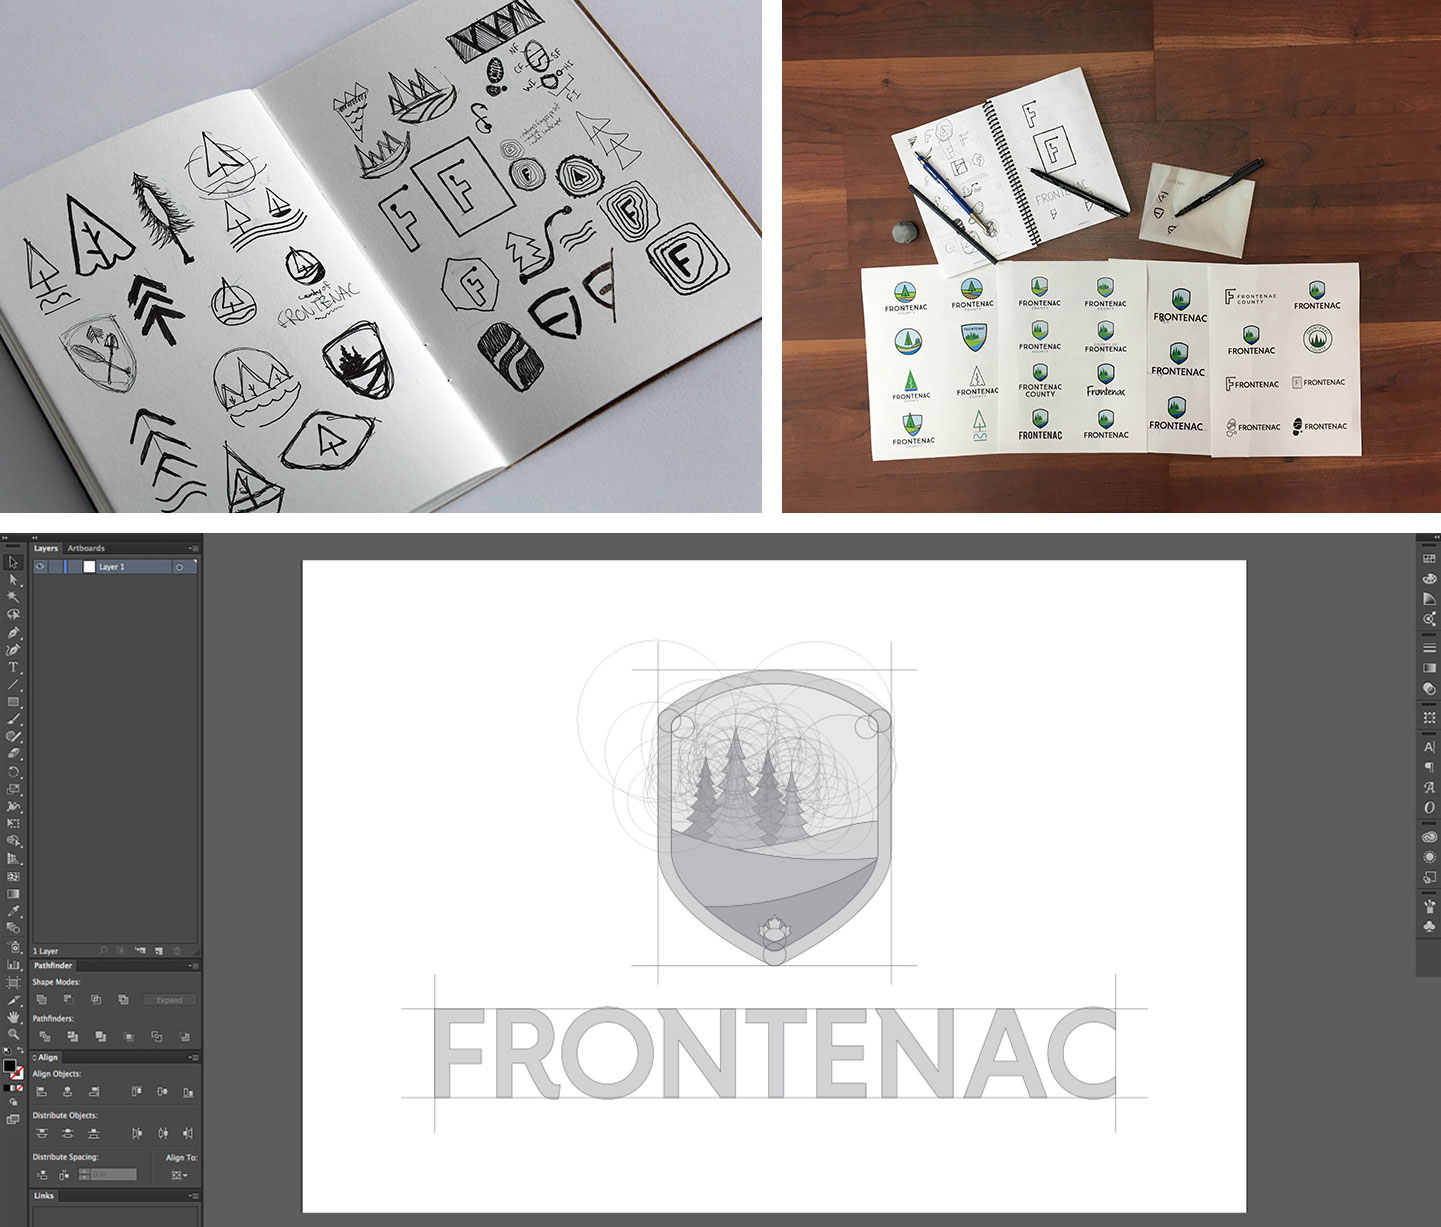 frontenac-logo-process